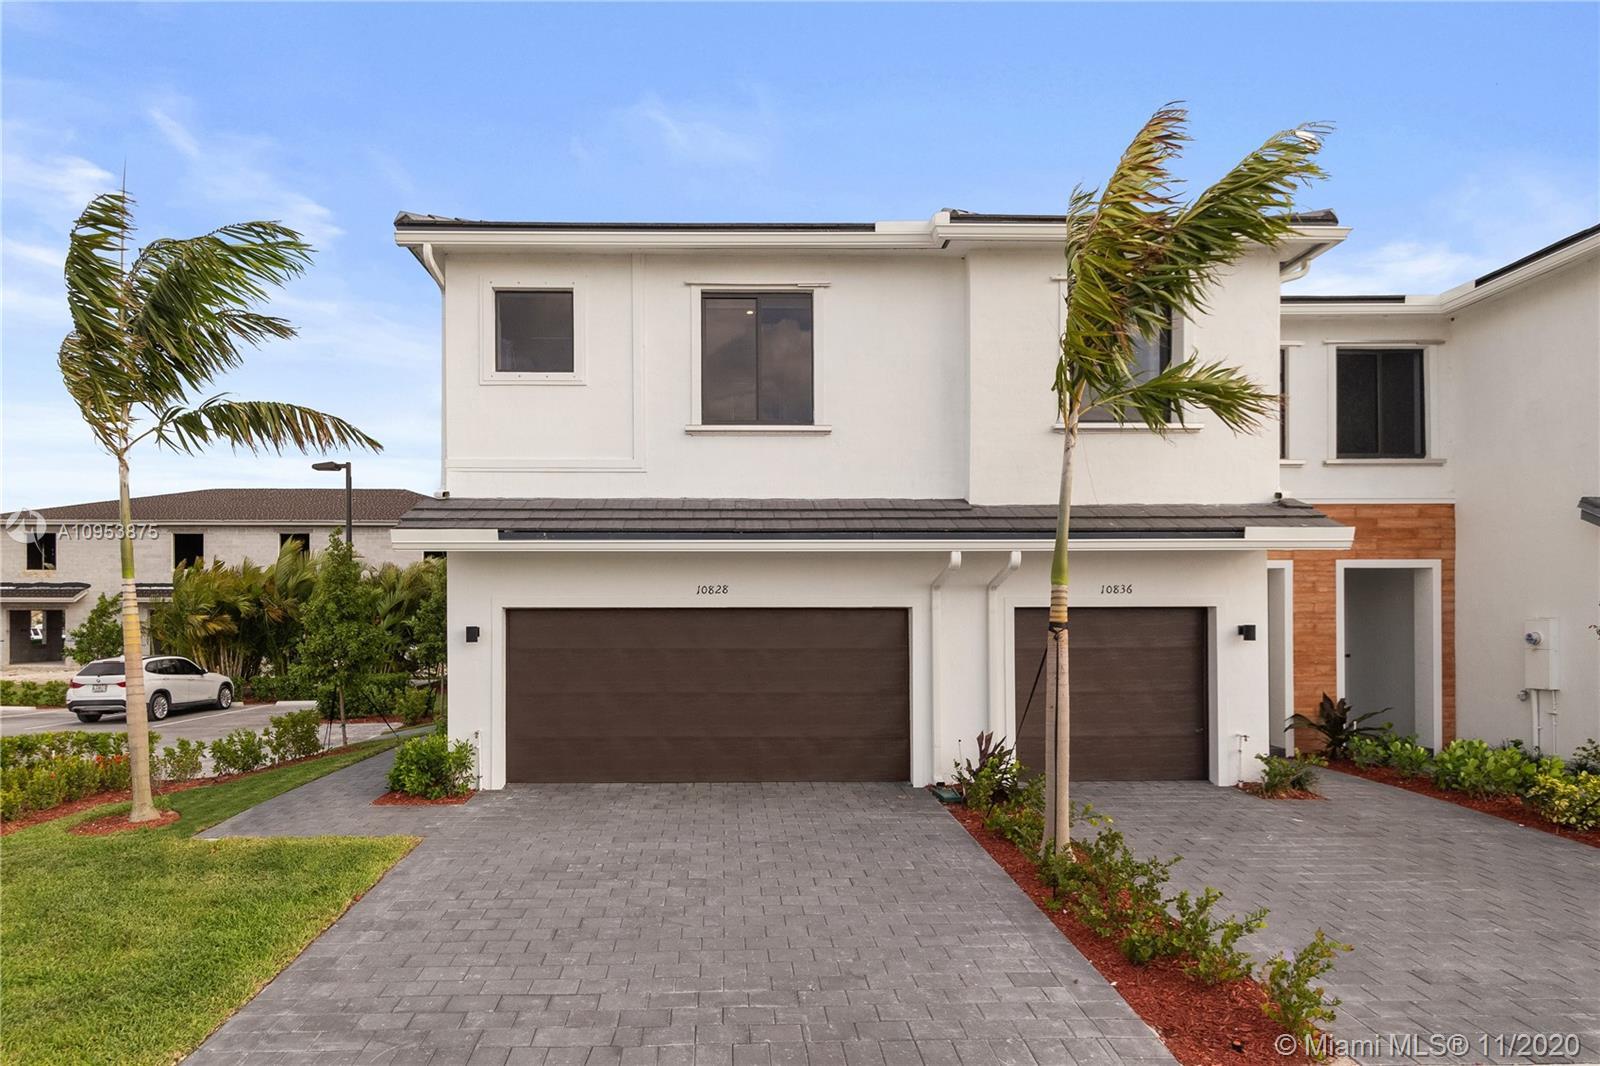 10974 SW 235th St Property Photo - Miami, FL real estate listing